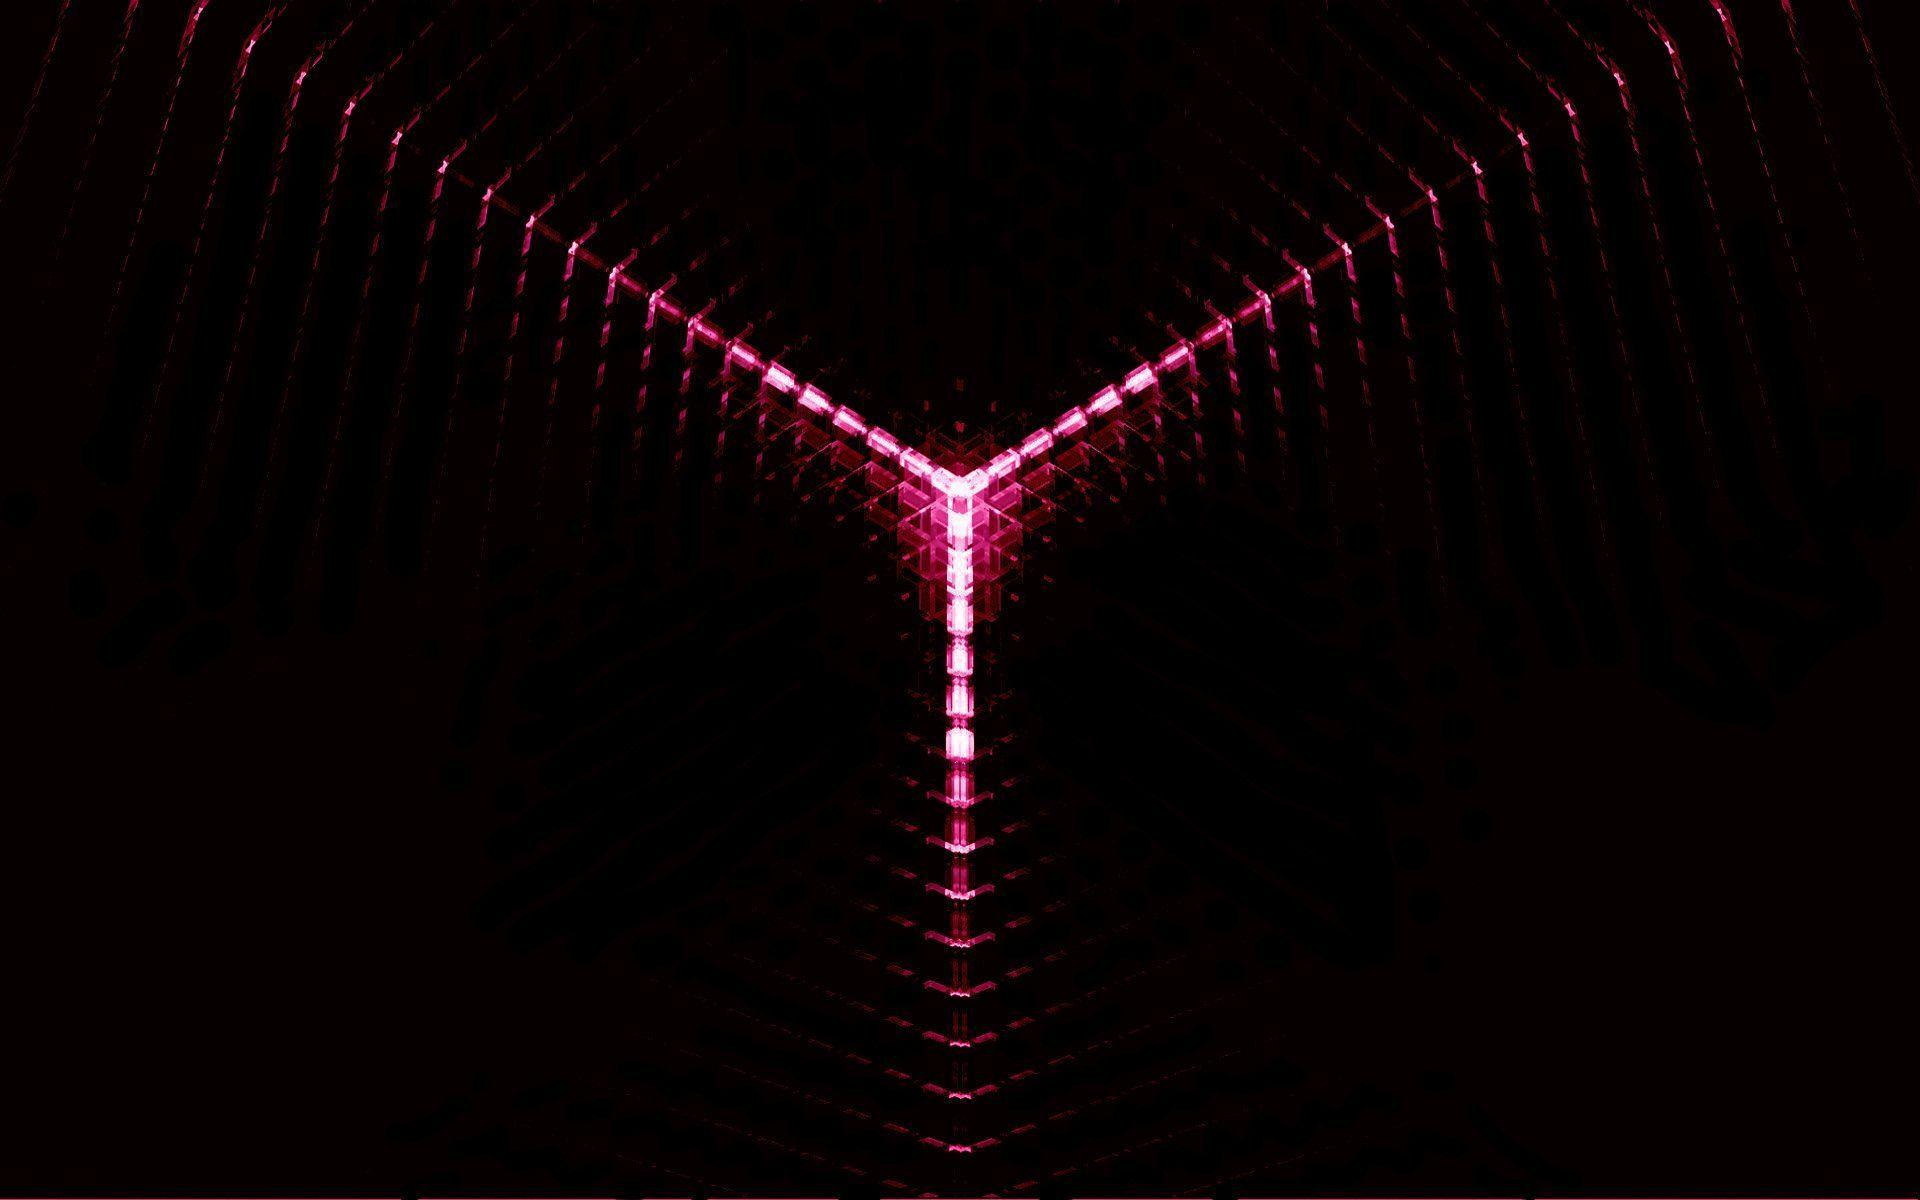 red neon wallpaper - photo #29